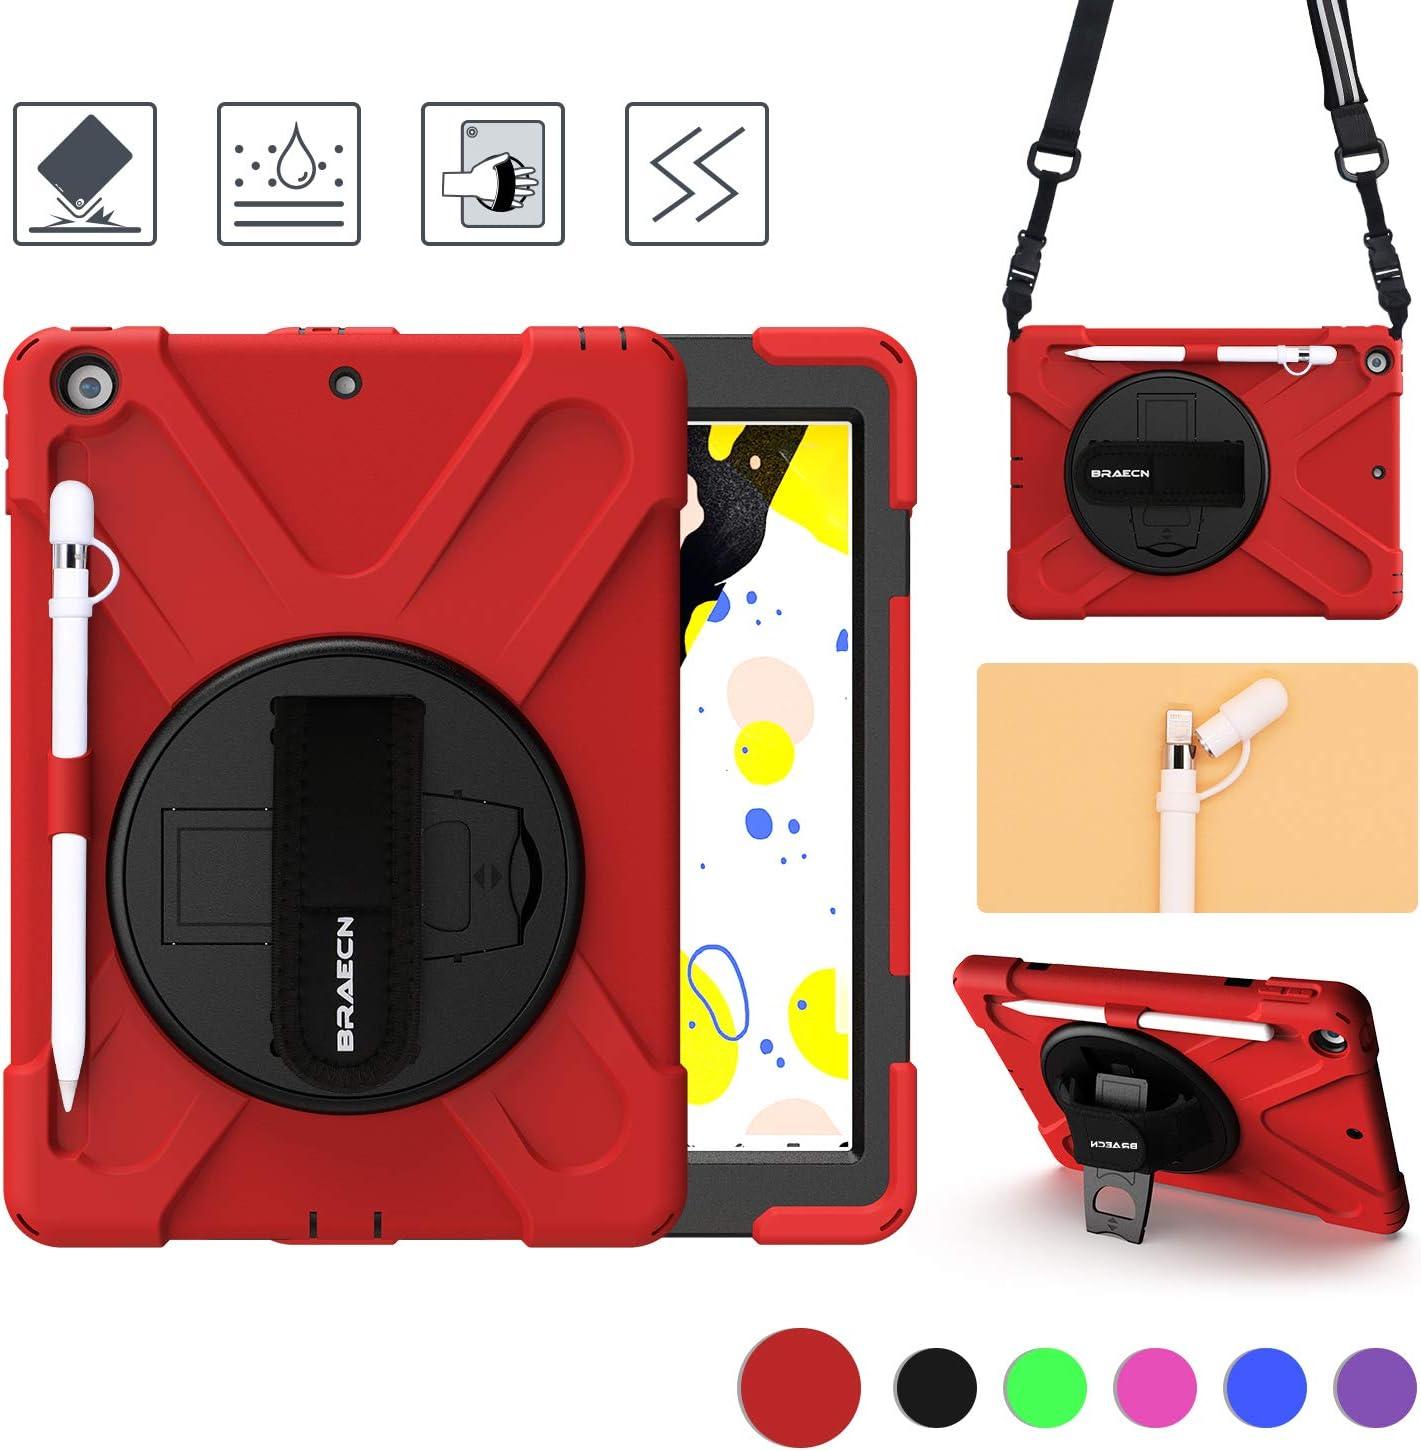 Funda BRAECN para iPad 10.2 2020 / 2019 A2197/A2198 (Rojo)